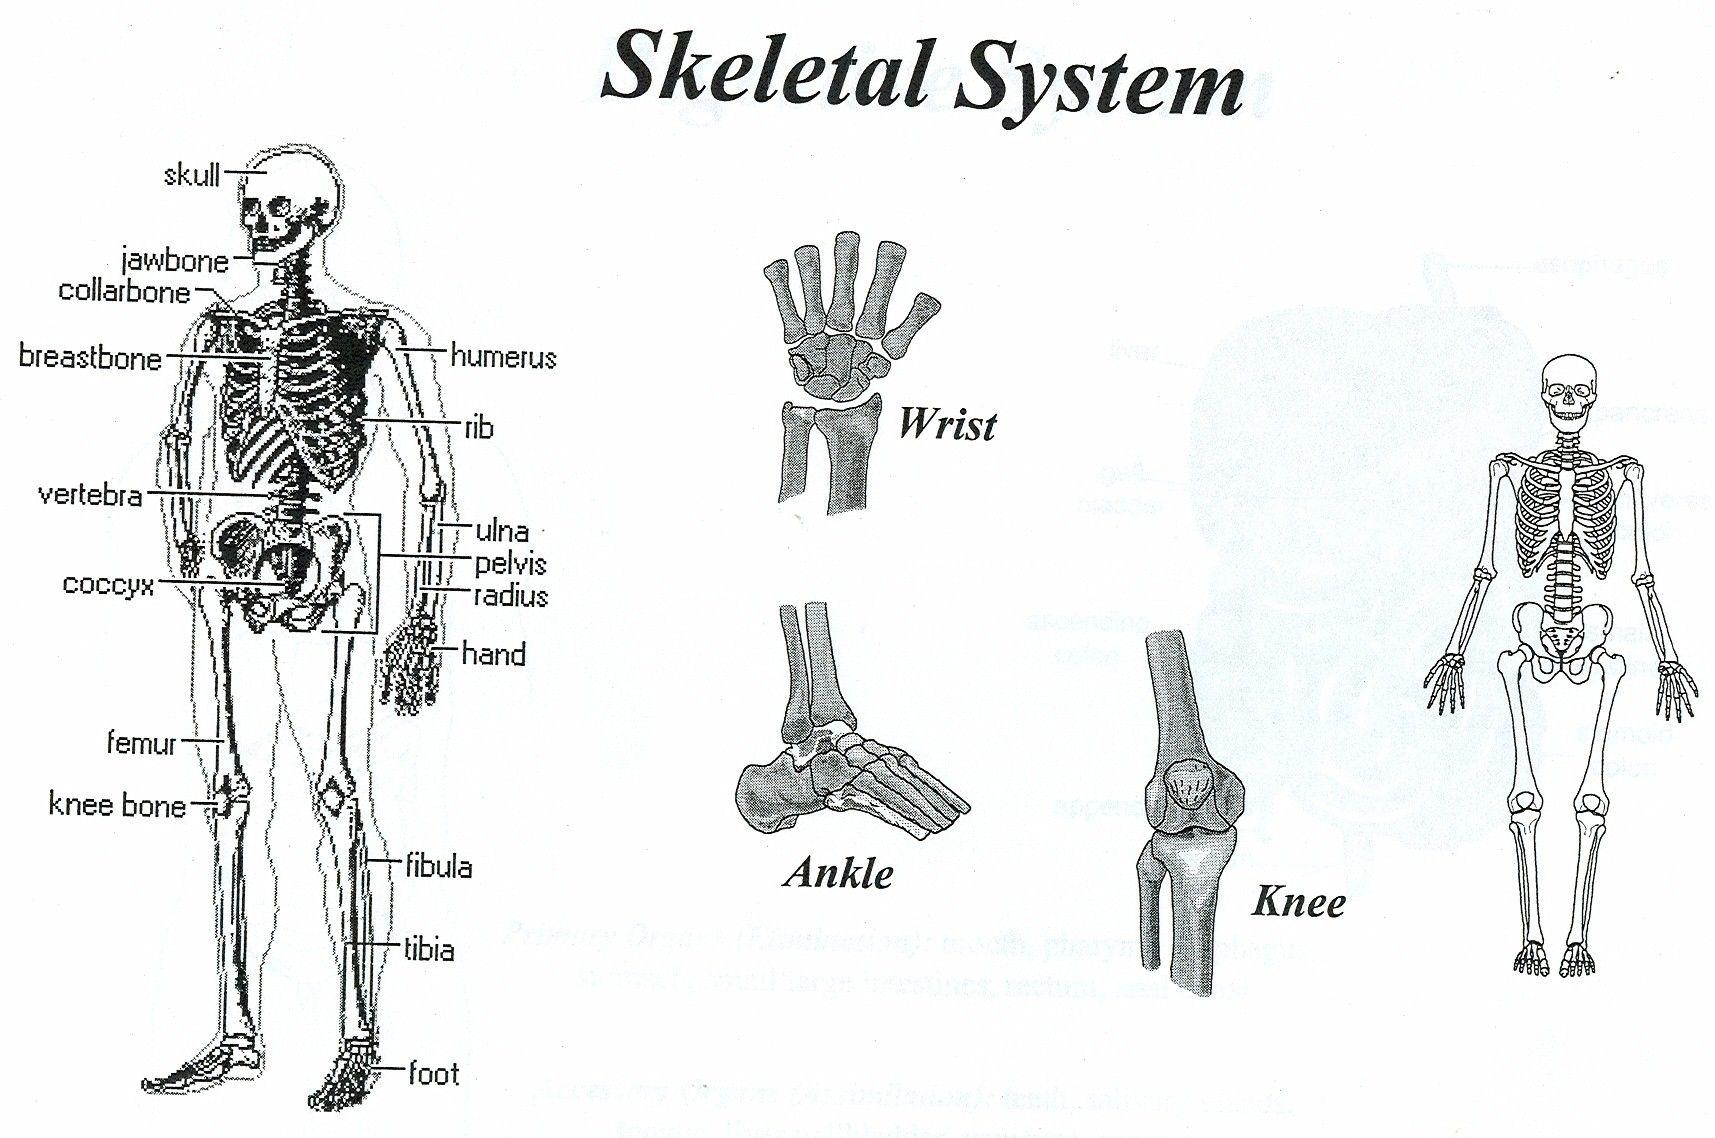 skeletal system | positive healthcare | positive healthcare, Muscles